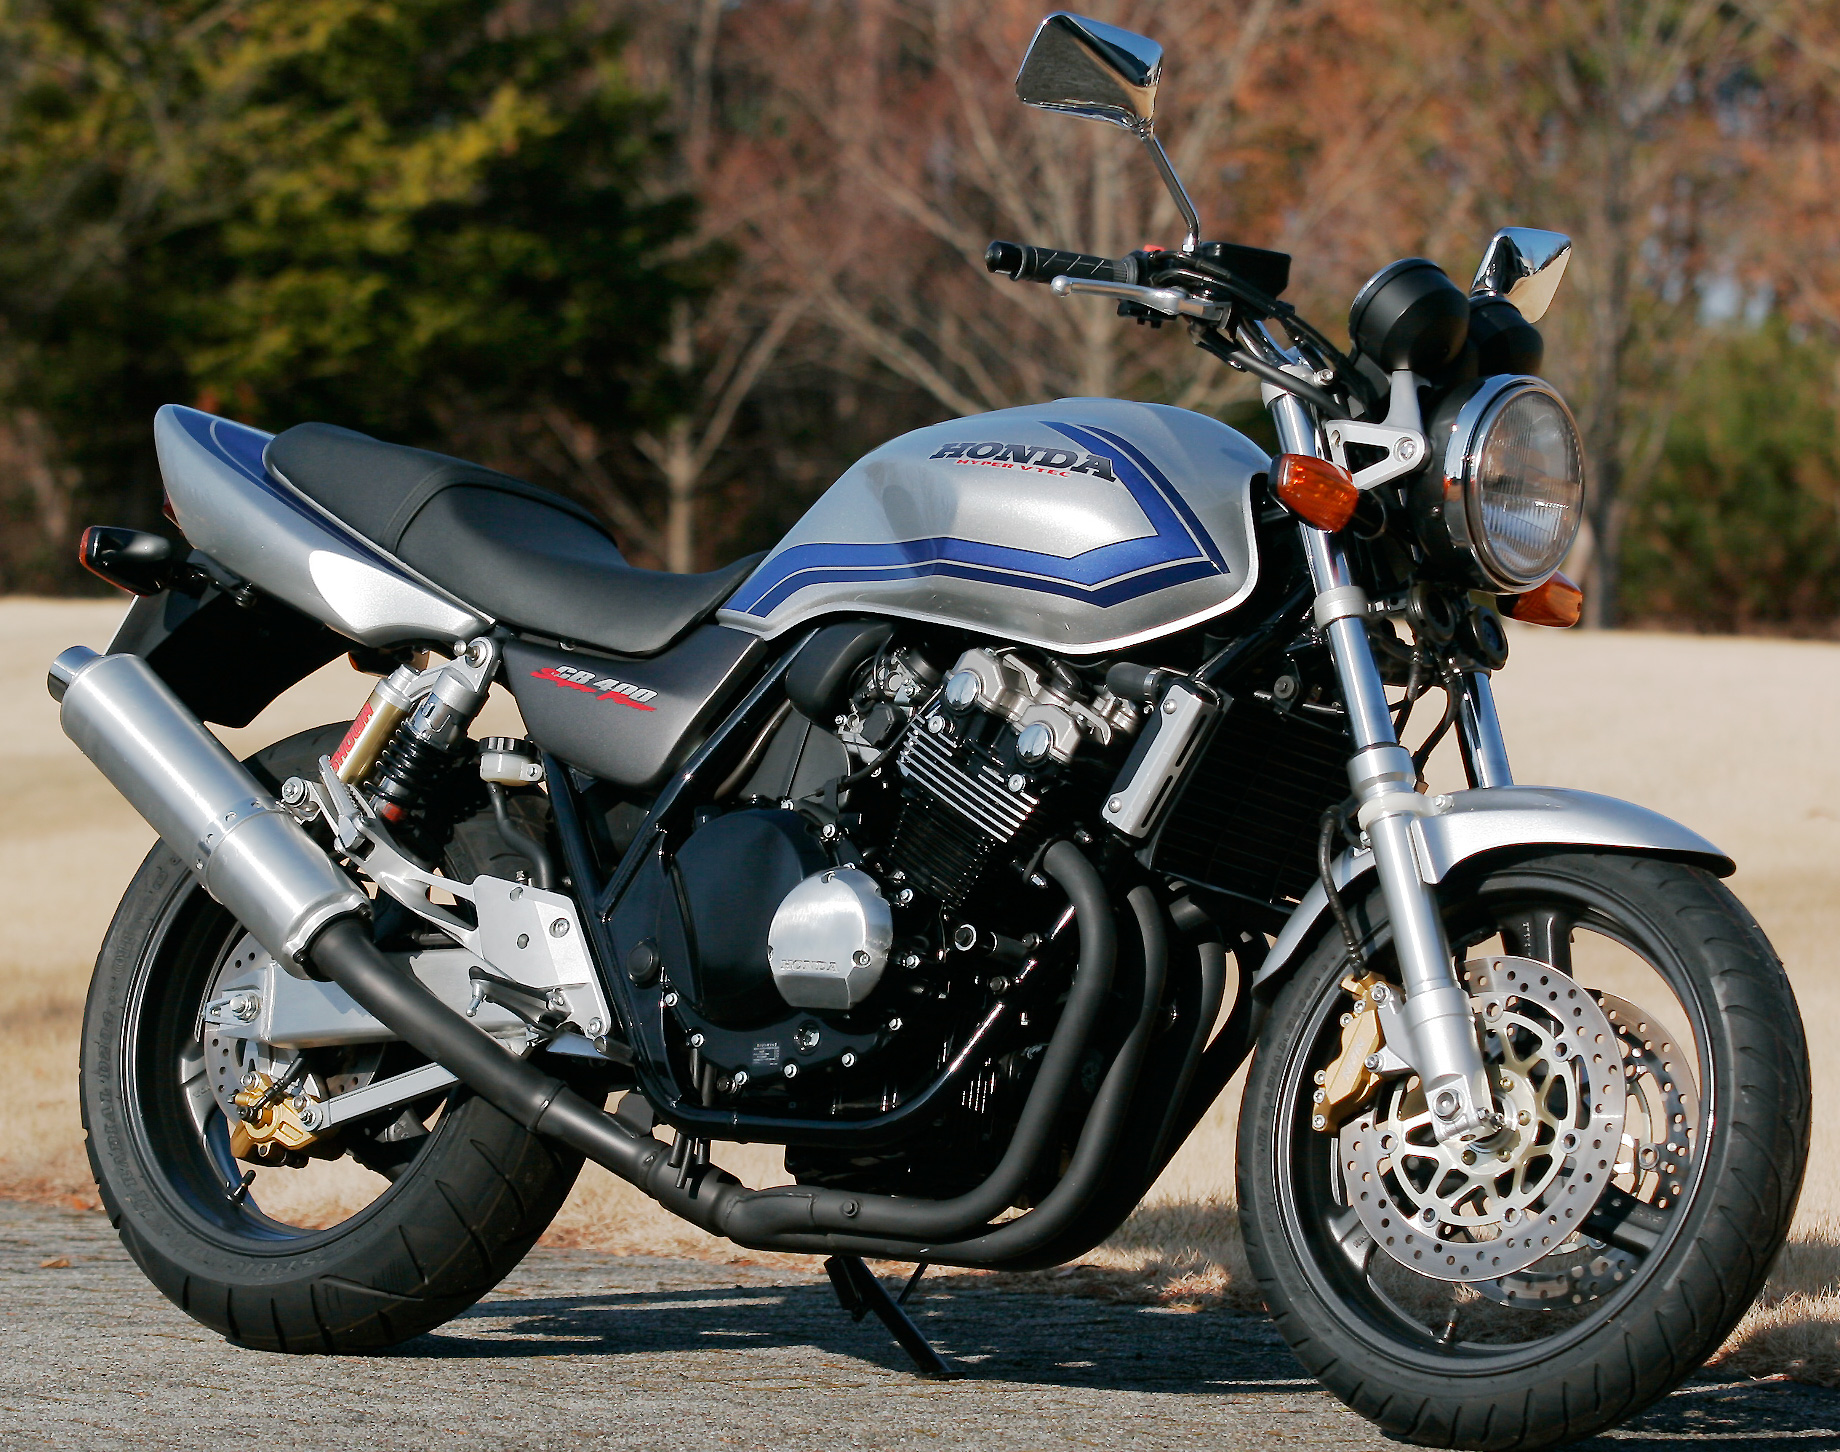 honda cb400 price - HD1840×1452